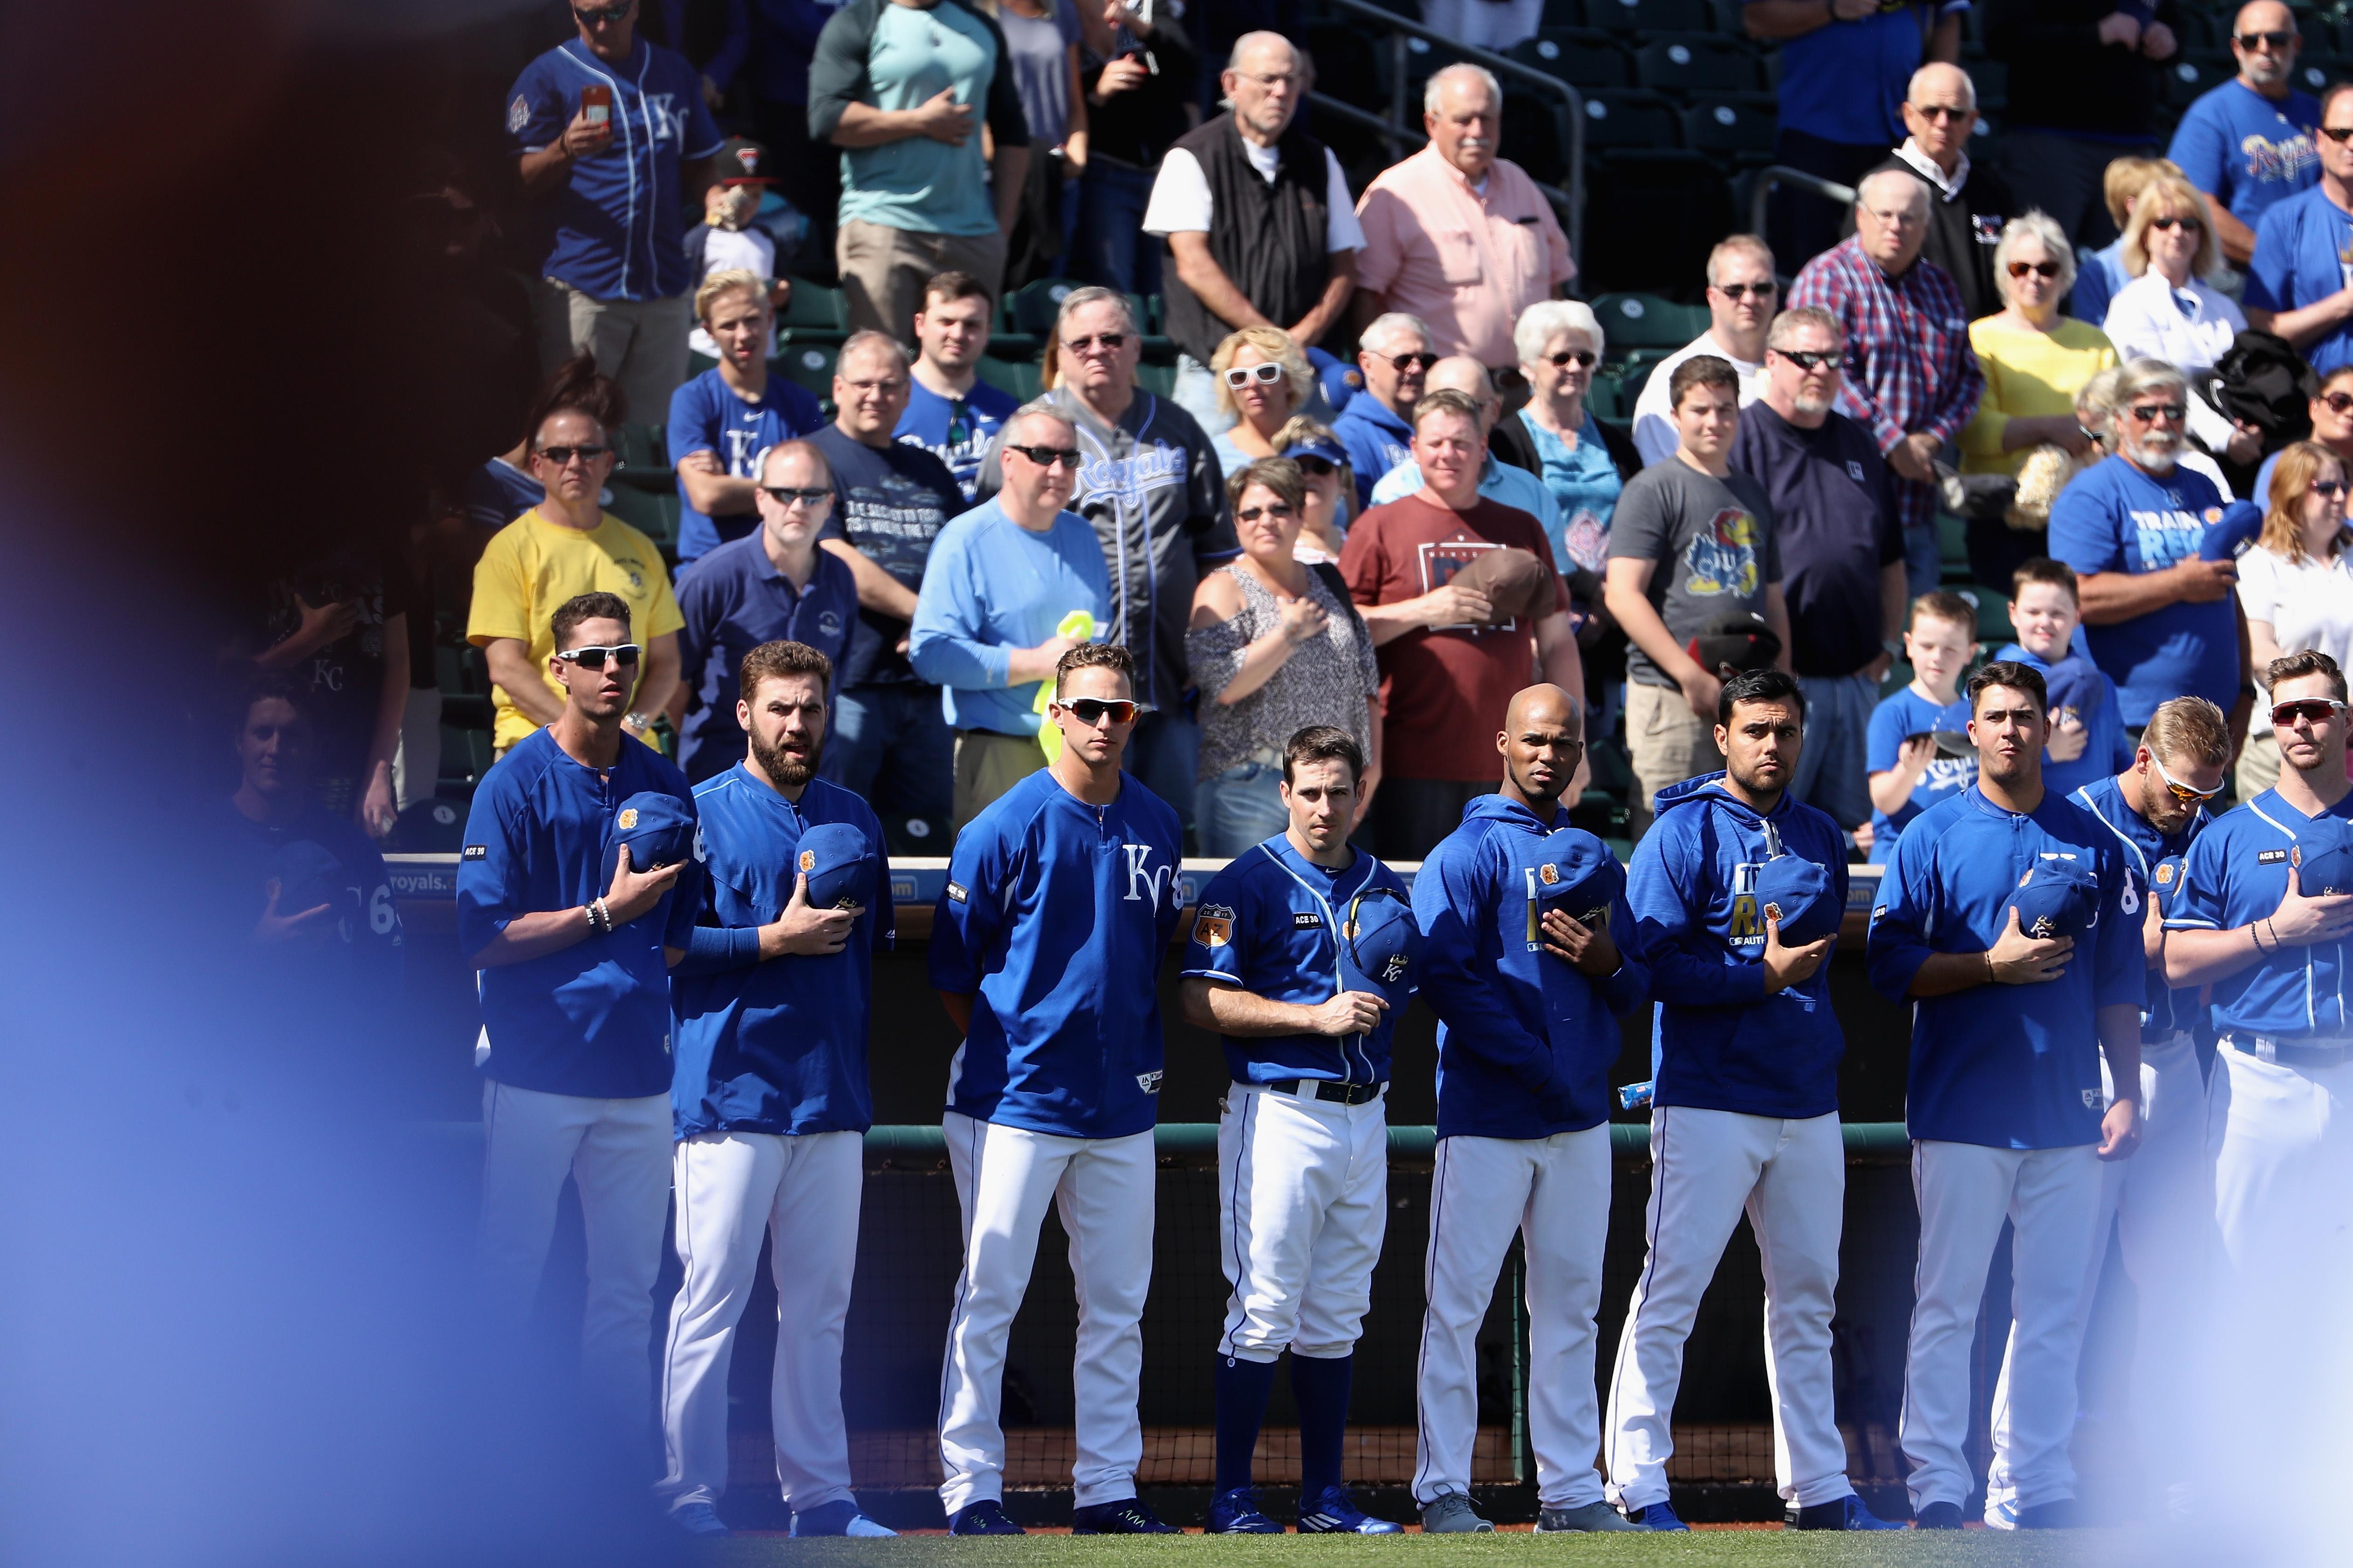 Texas Rangers v Kansas City Royals